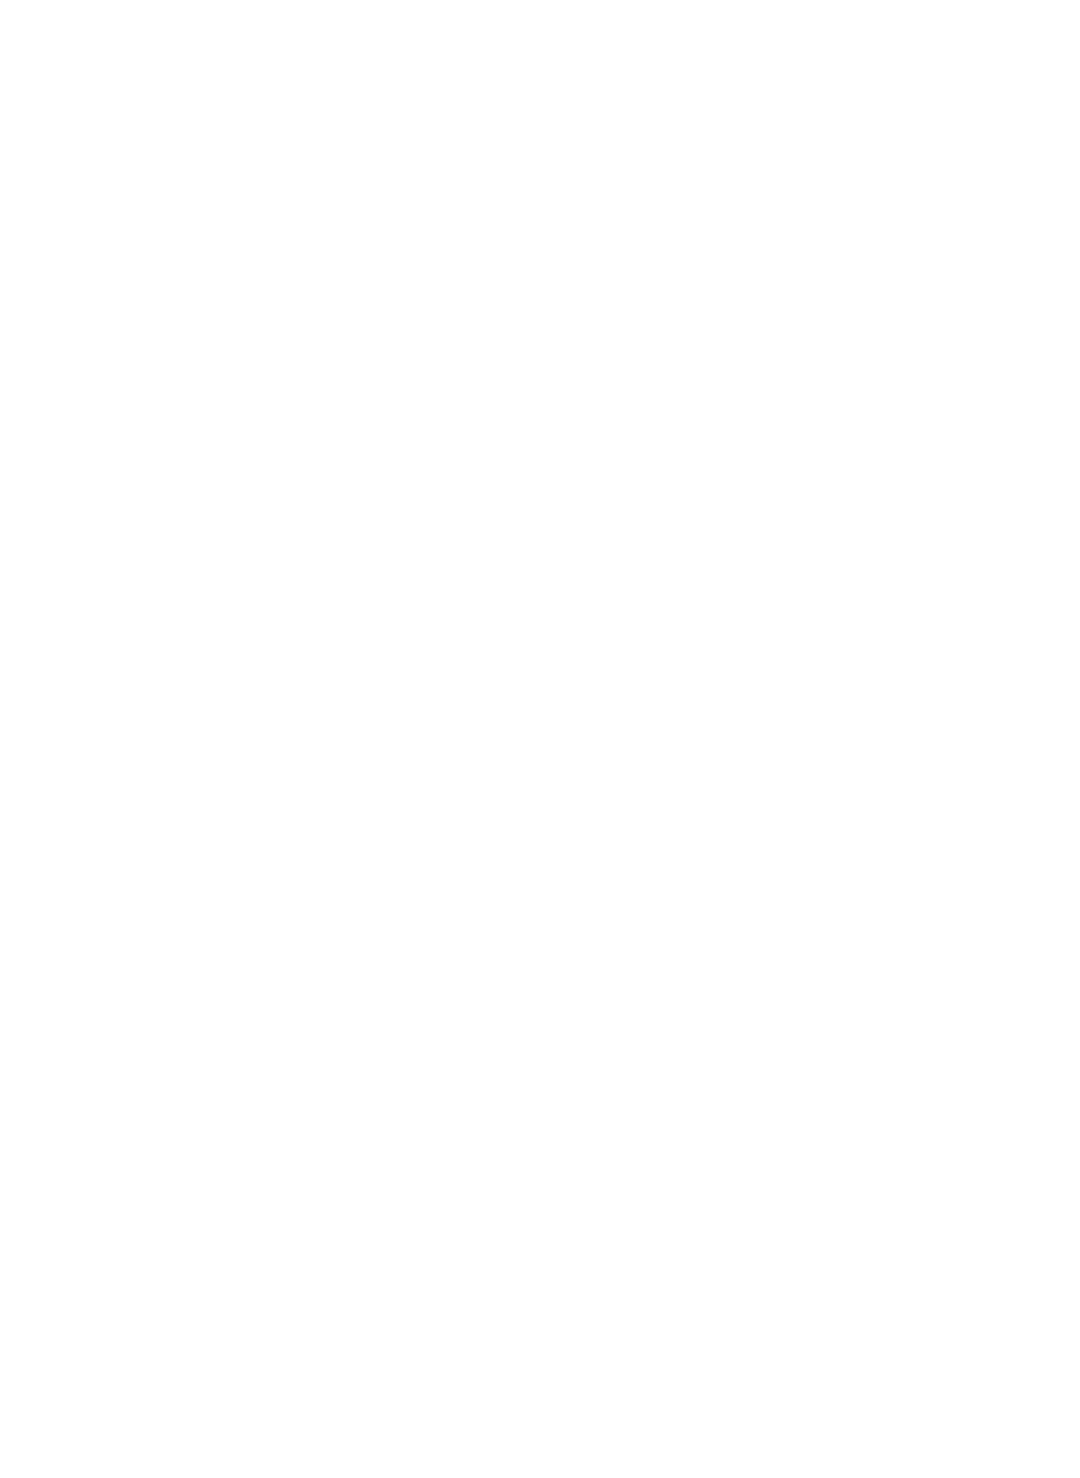 BMS1102S_trans-white_padding.png